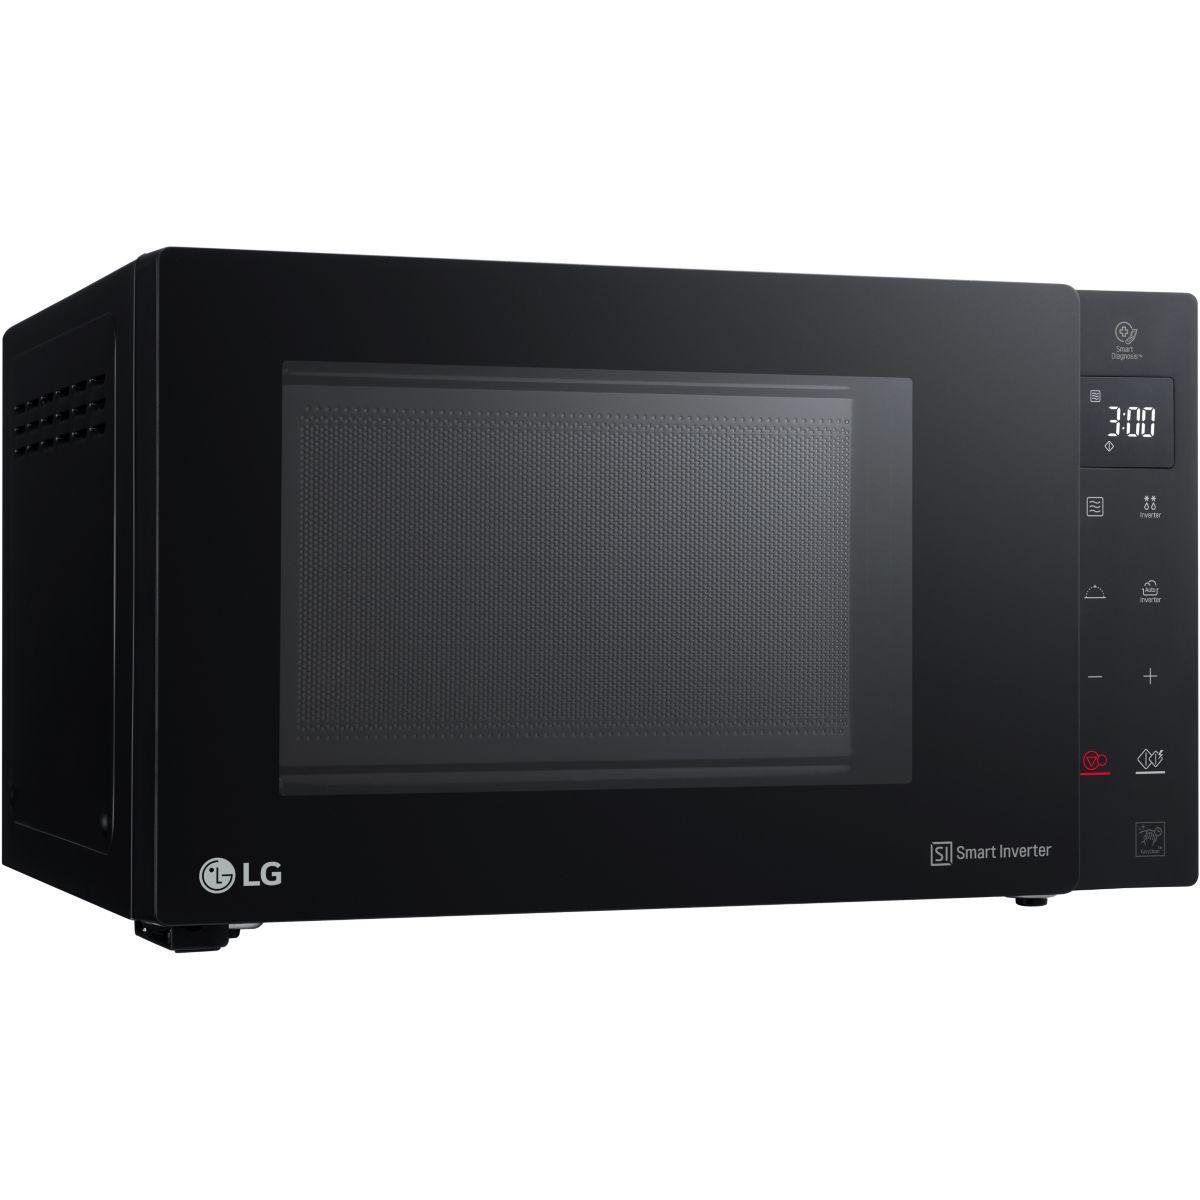 Micro-onde monofonction lg ms2535gdb - 20% de remise : code gam20